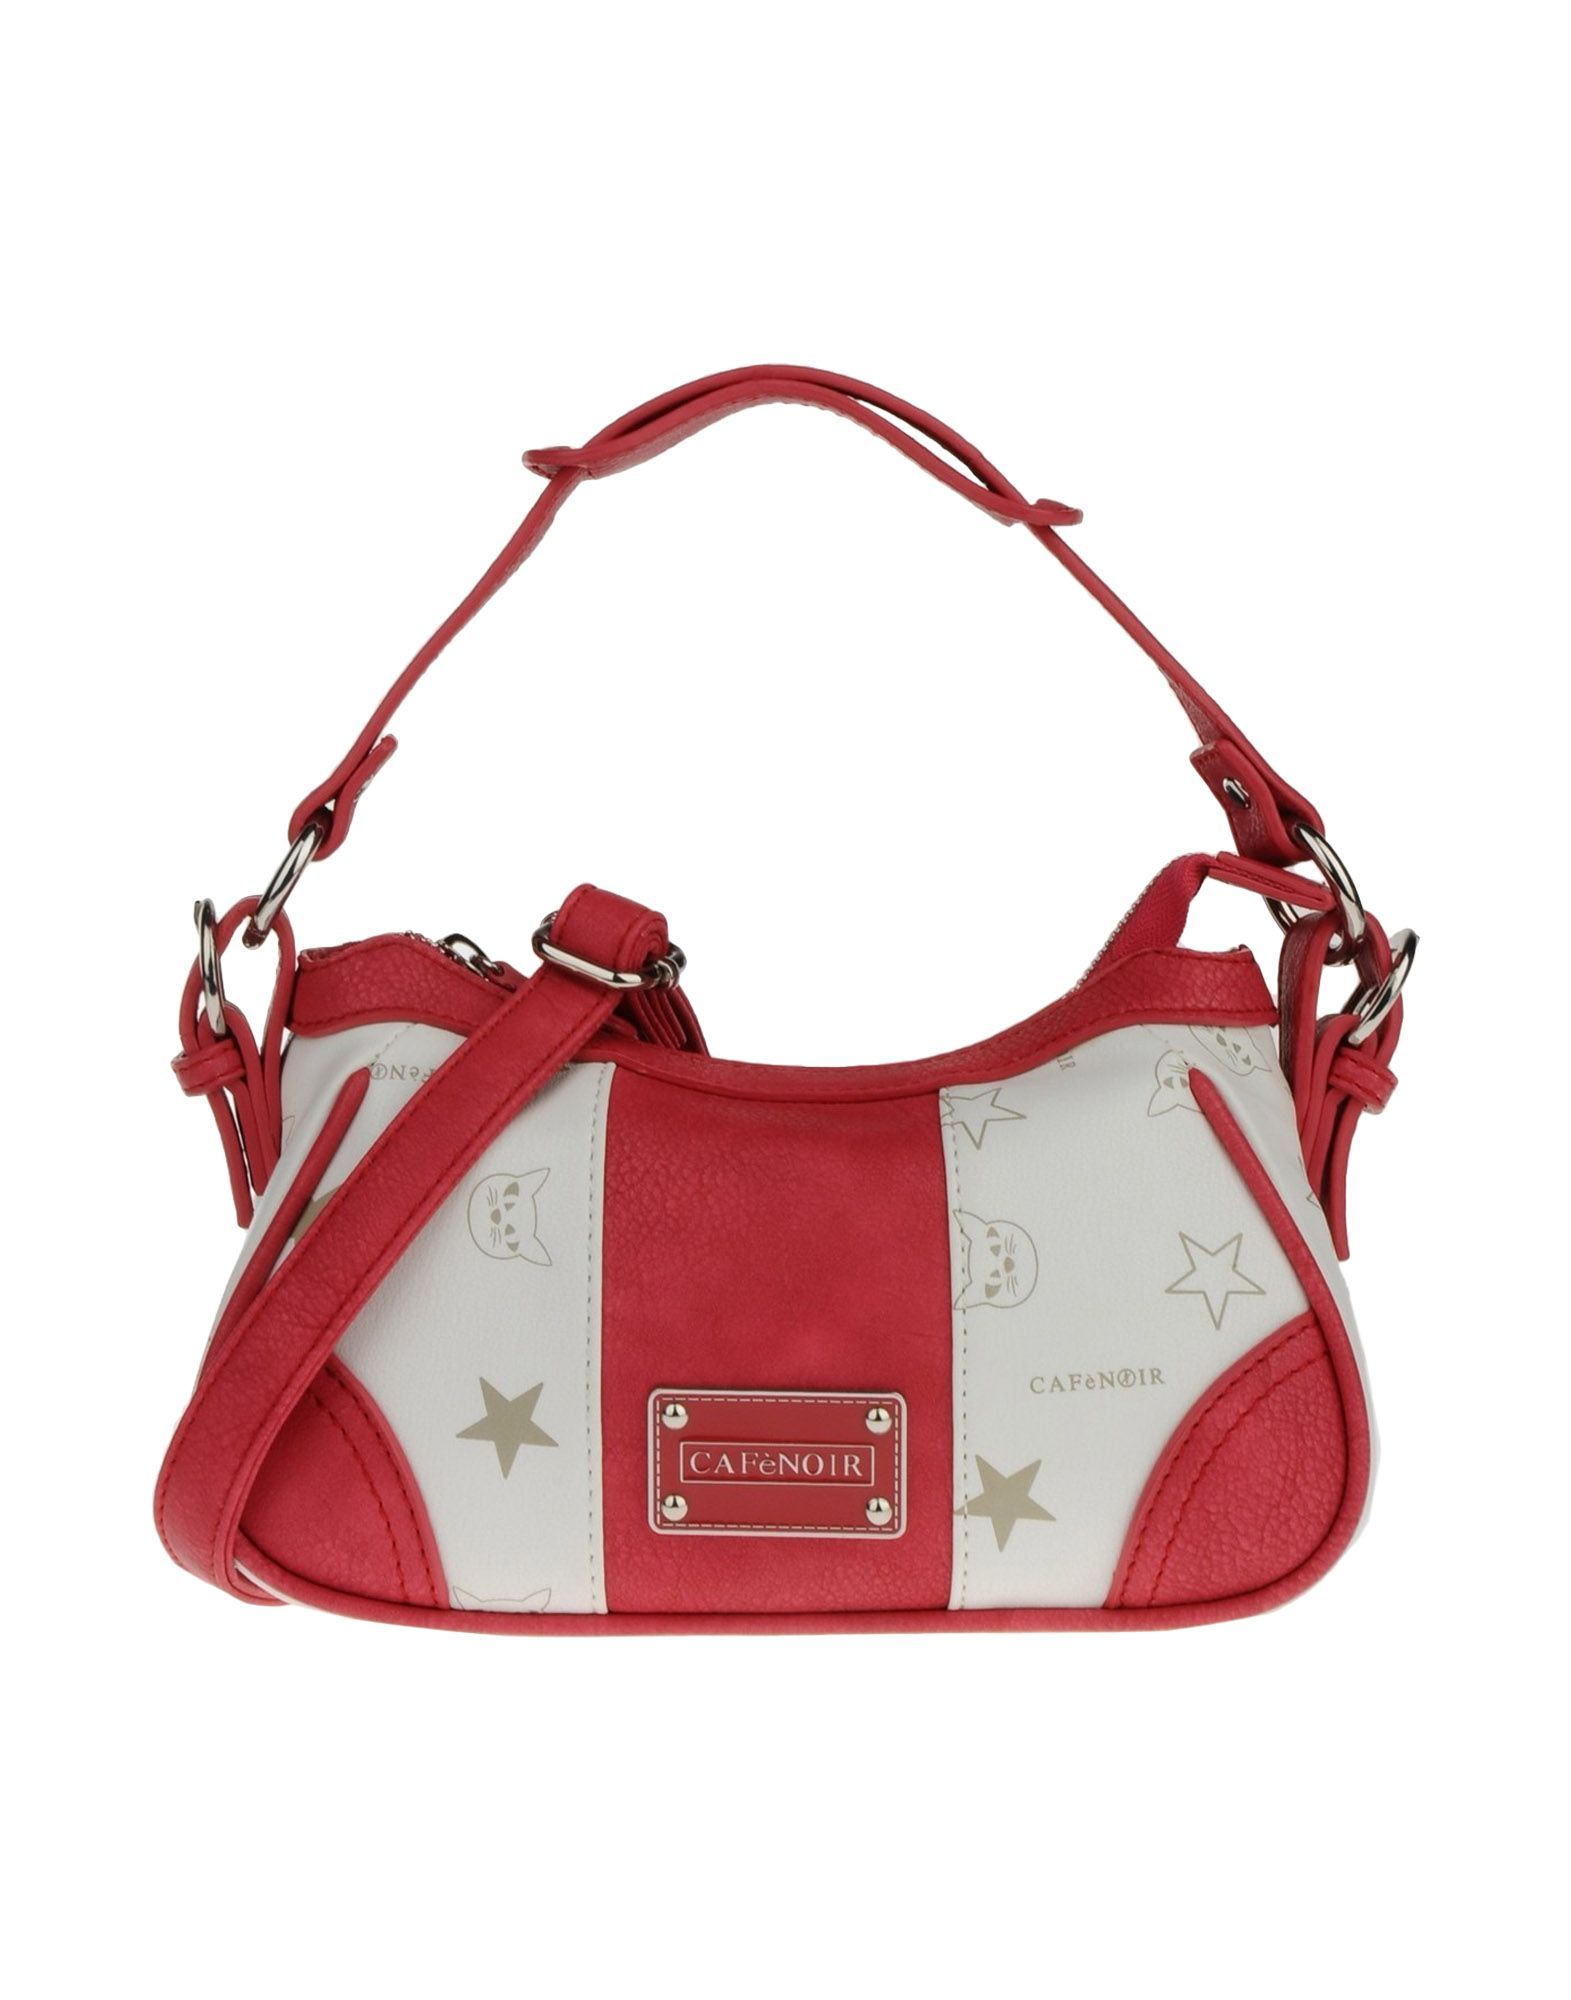 Cafe Noir Coral White Mini Shoulder Bag w Silver Hardware  c7452f00d24